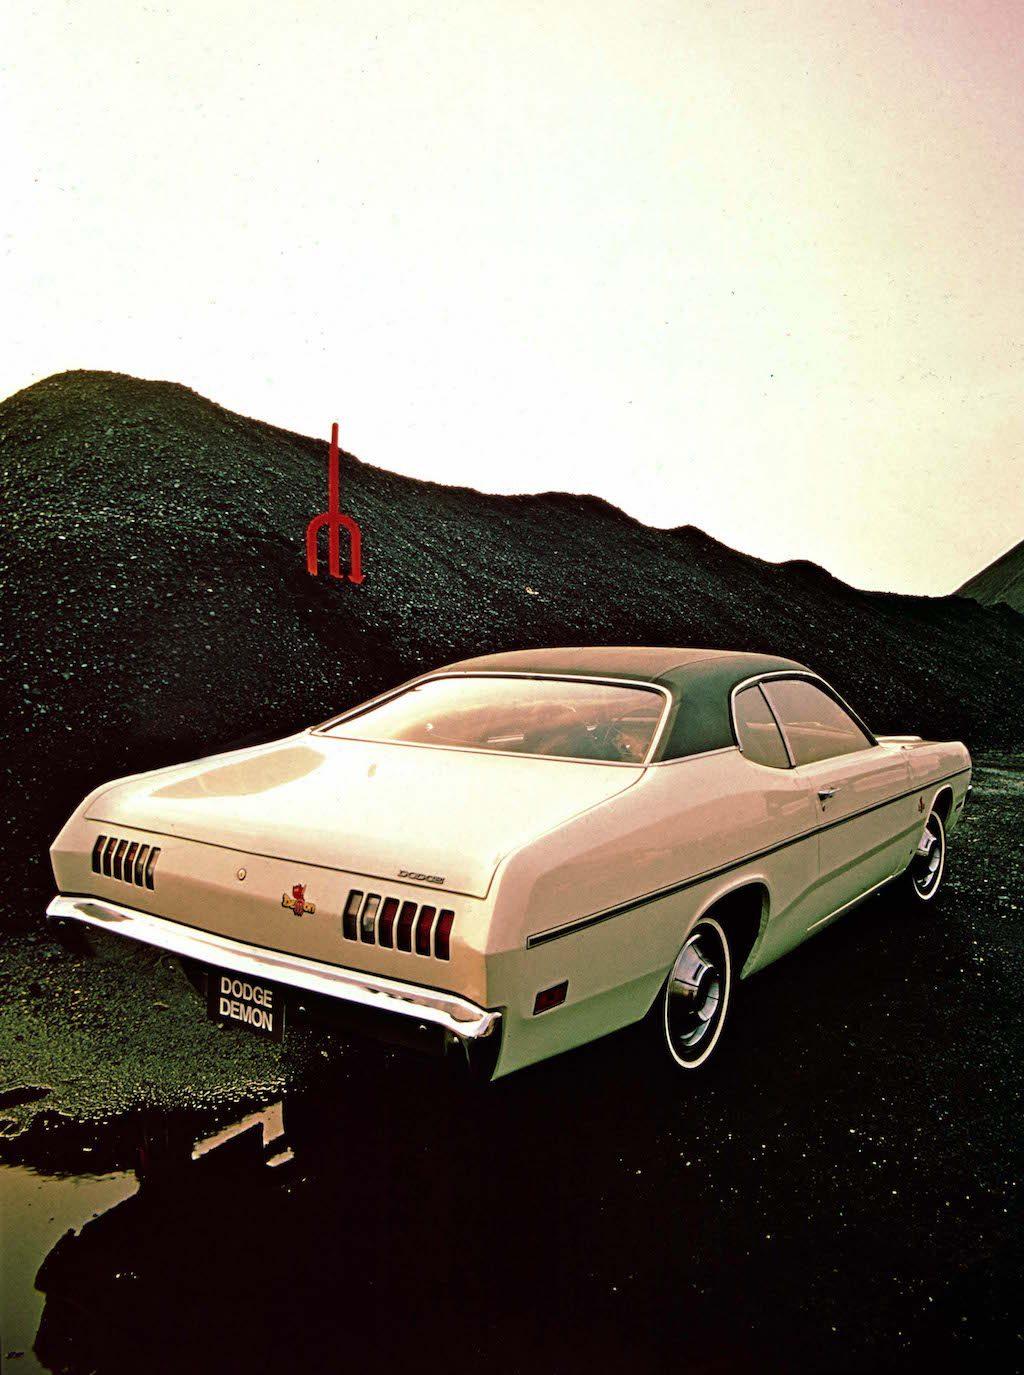 1971 Dodge Demon   Fiat Chrysler Automobiles